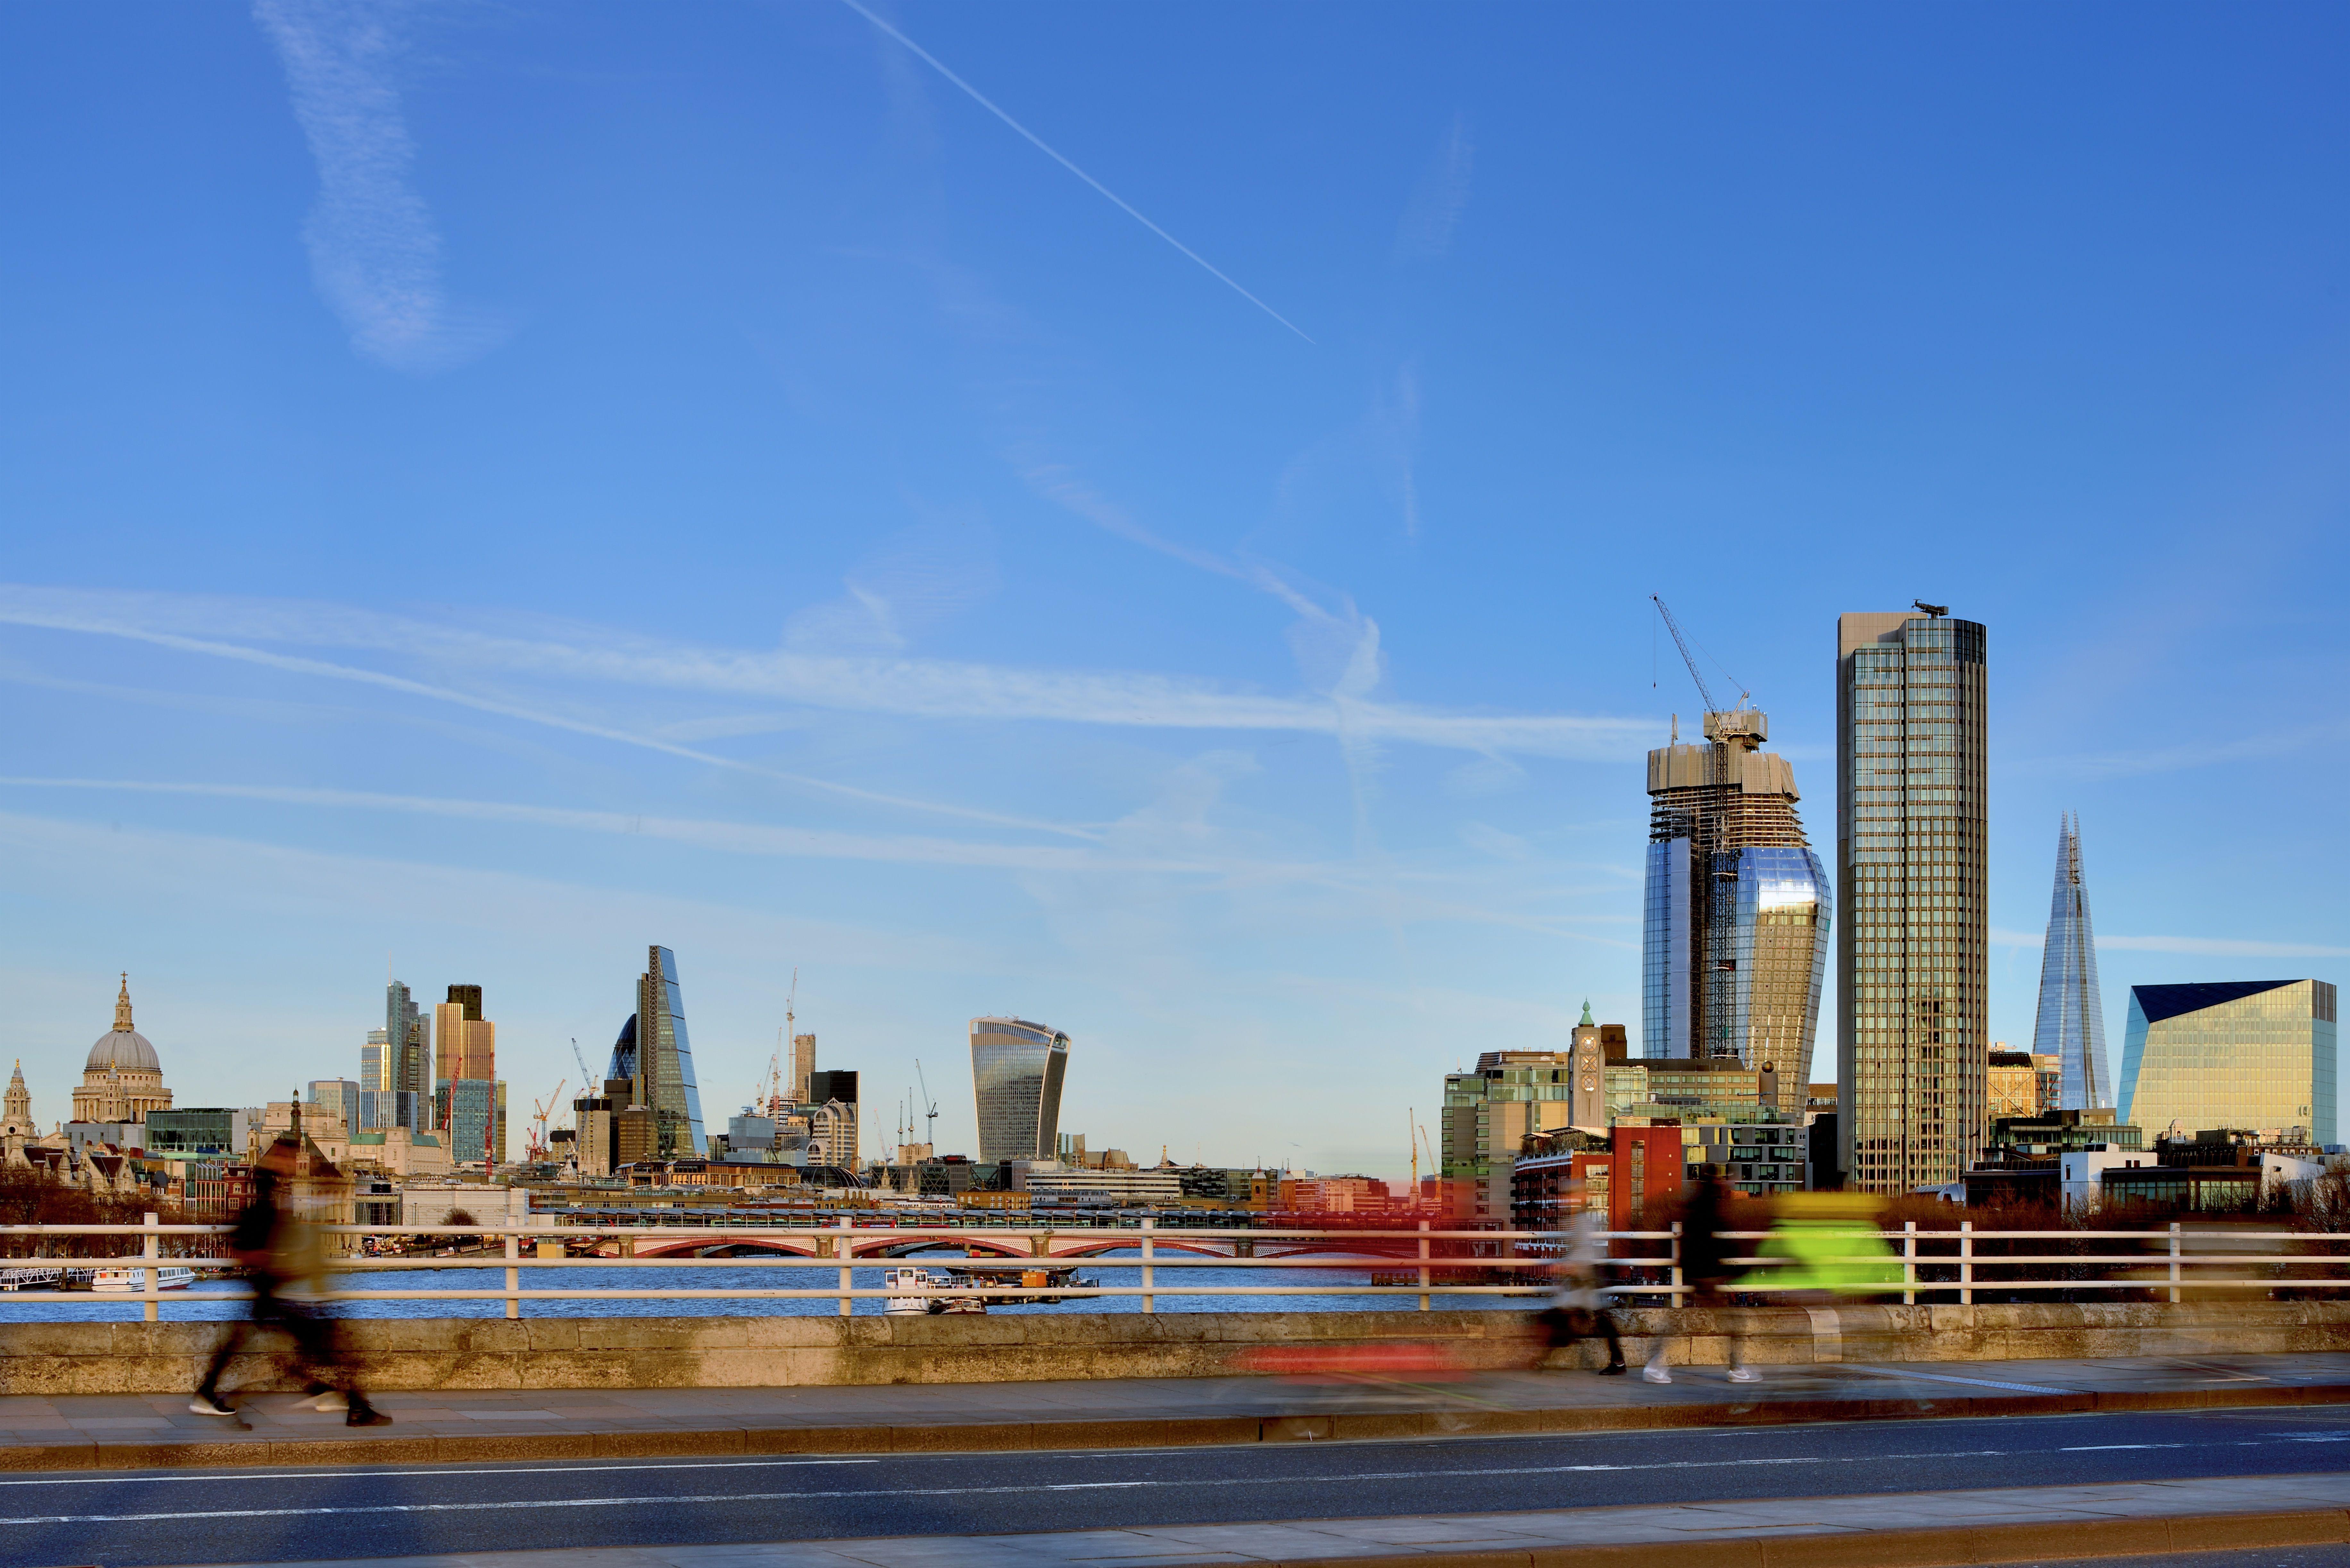 The Waterloo Bridge